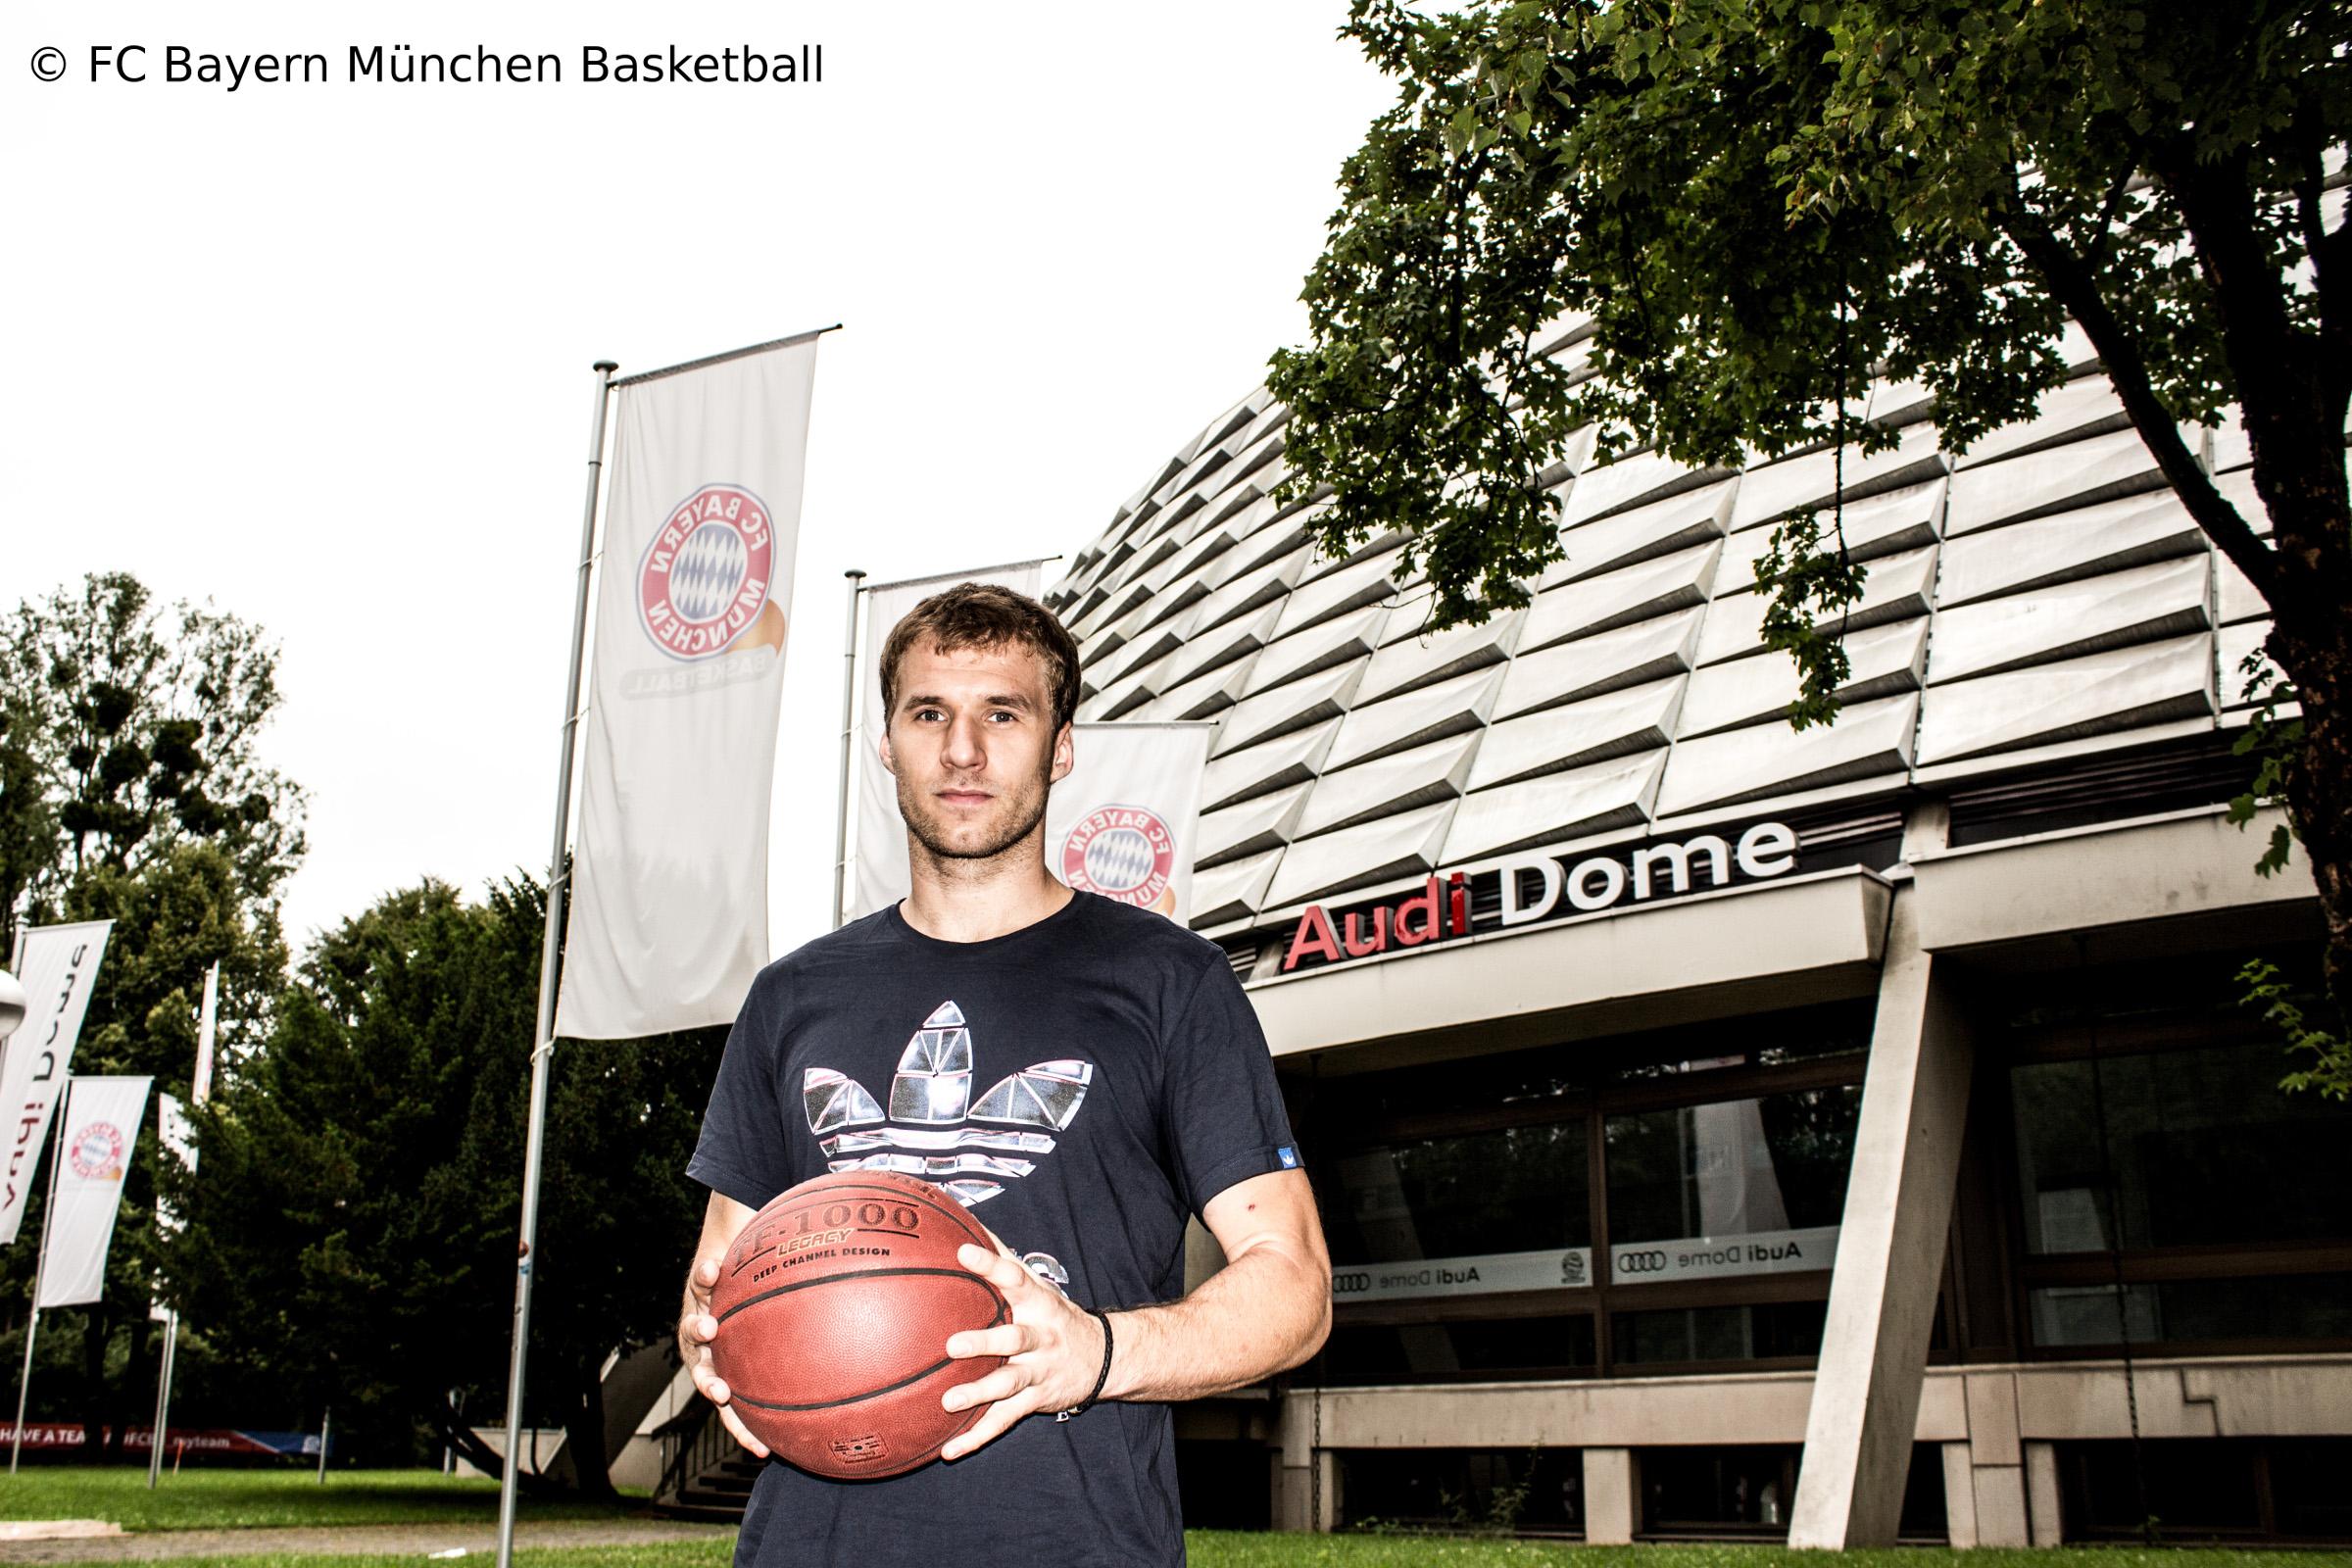 Wichtige Vertragsverlängerung beim FC Bayern Basketball